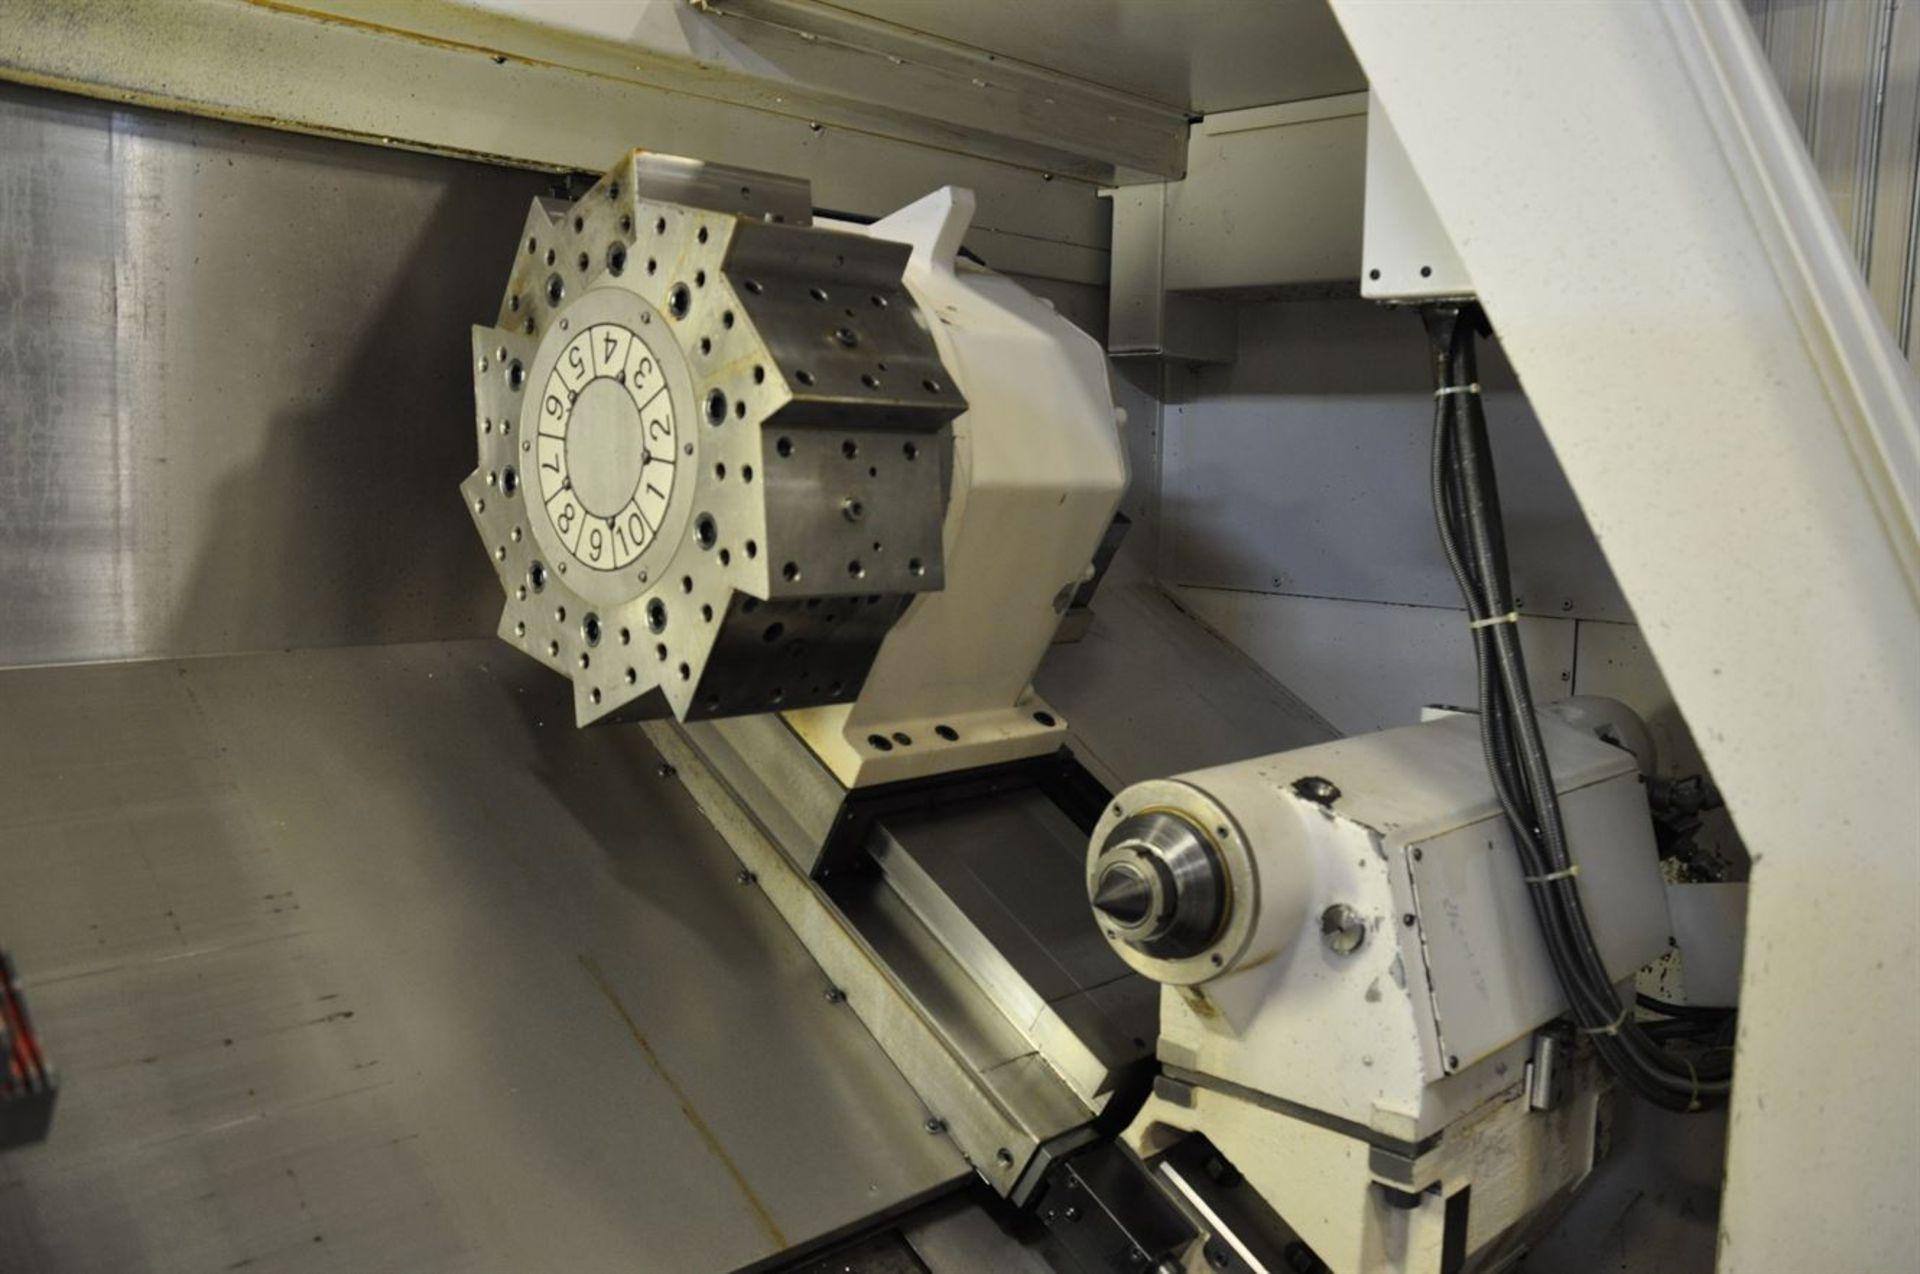 "2012 OKUMA LB35 II Turning Centers, s/n 163796, w/ OSP-P200L Control, 7"" Bore, SCHUNK 600 mm 4 Jaw - Image 4 of 11"